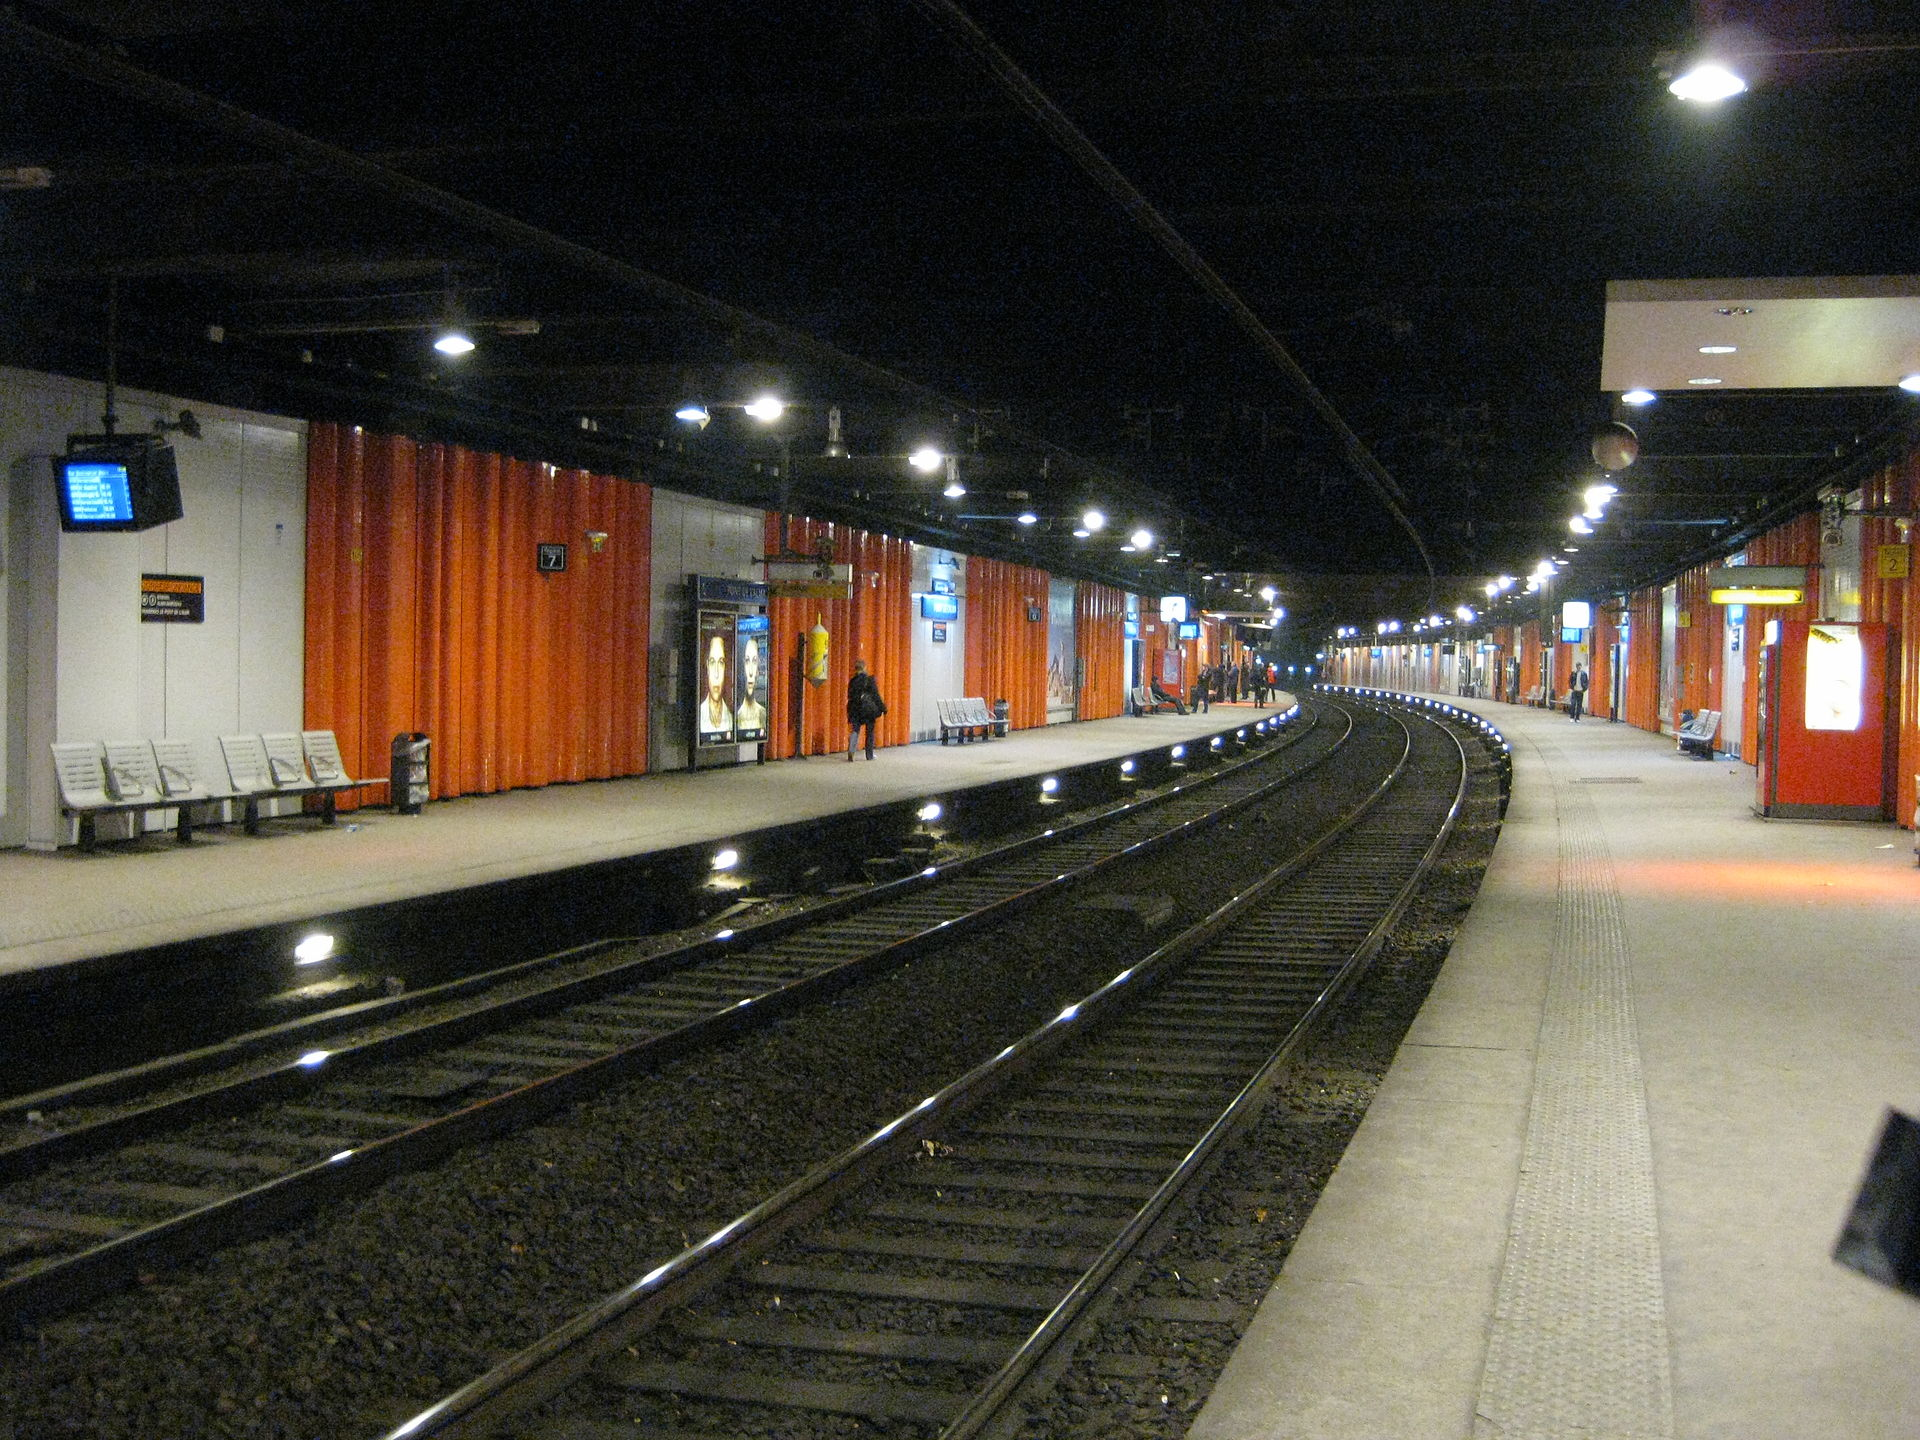 Pont de l 39 alma paris rer wikipedia - Trajet metro gare de lyon porte de versailles ...